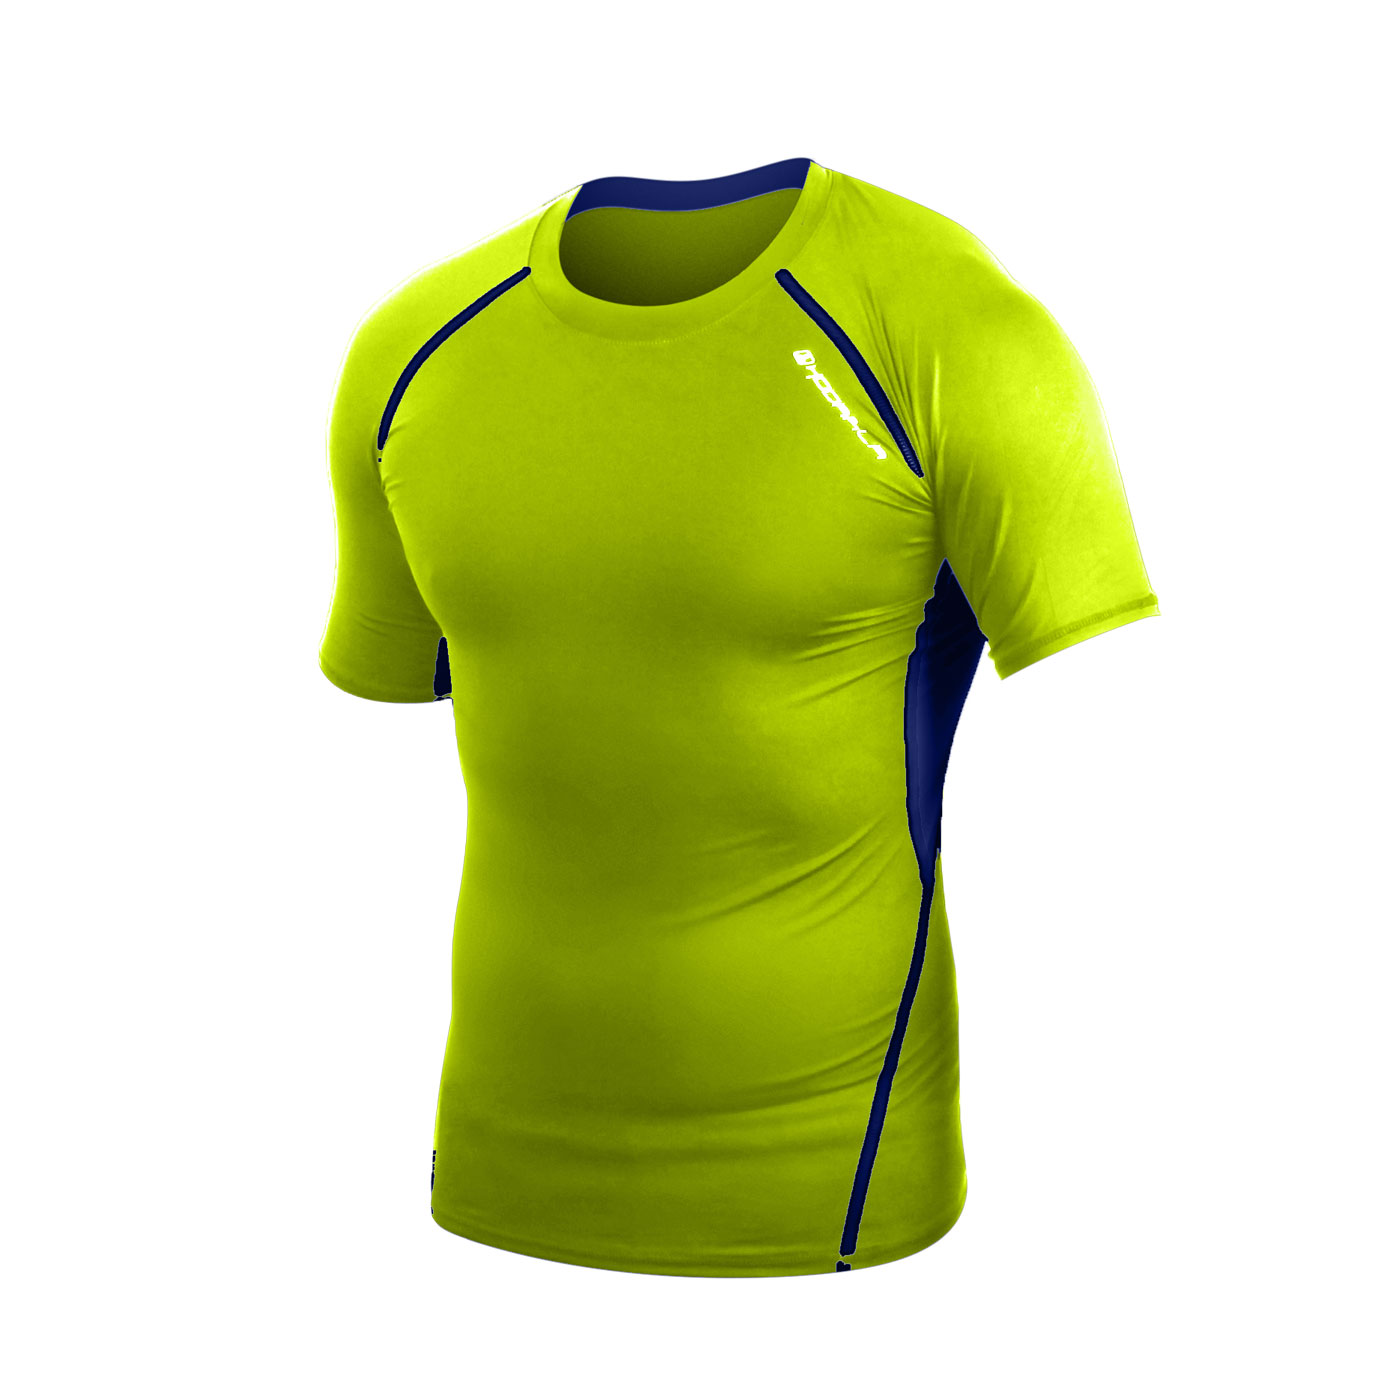 HODARLA 肌動圓領短袖緊身衣 3115501 - 螢光黃藍